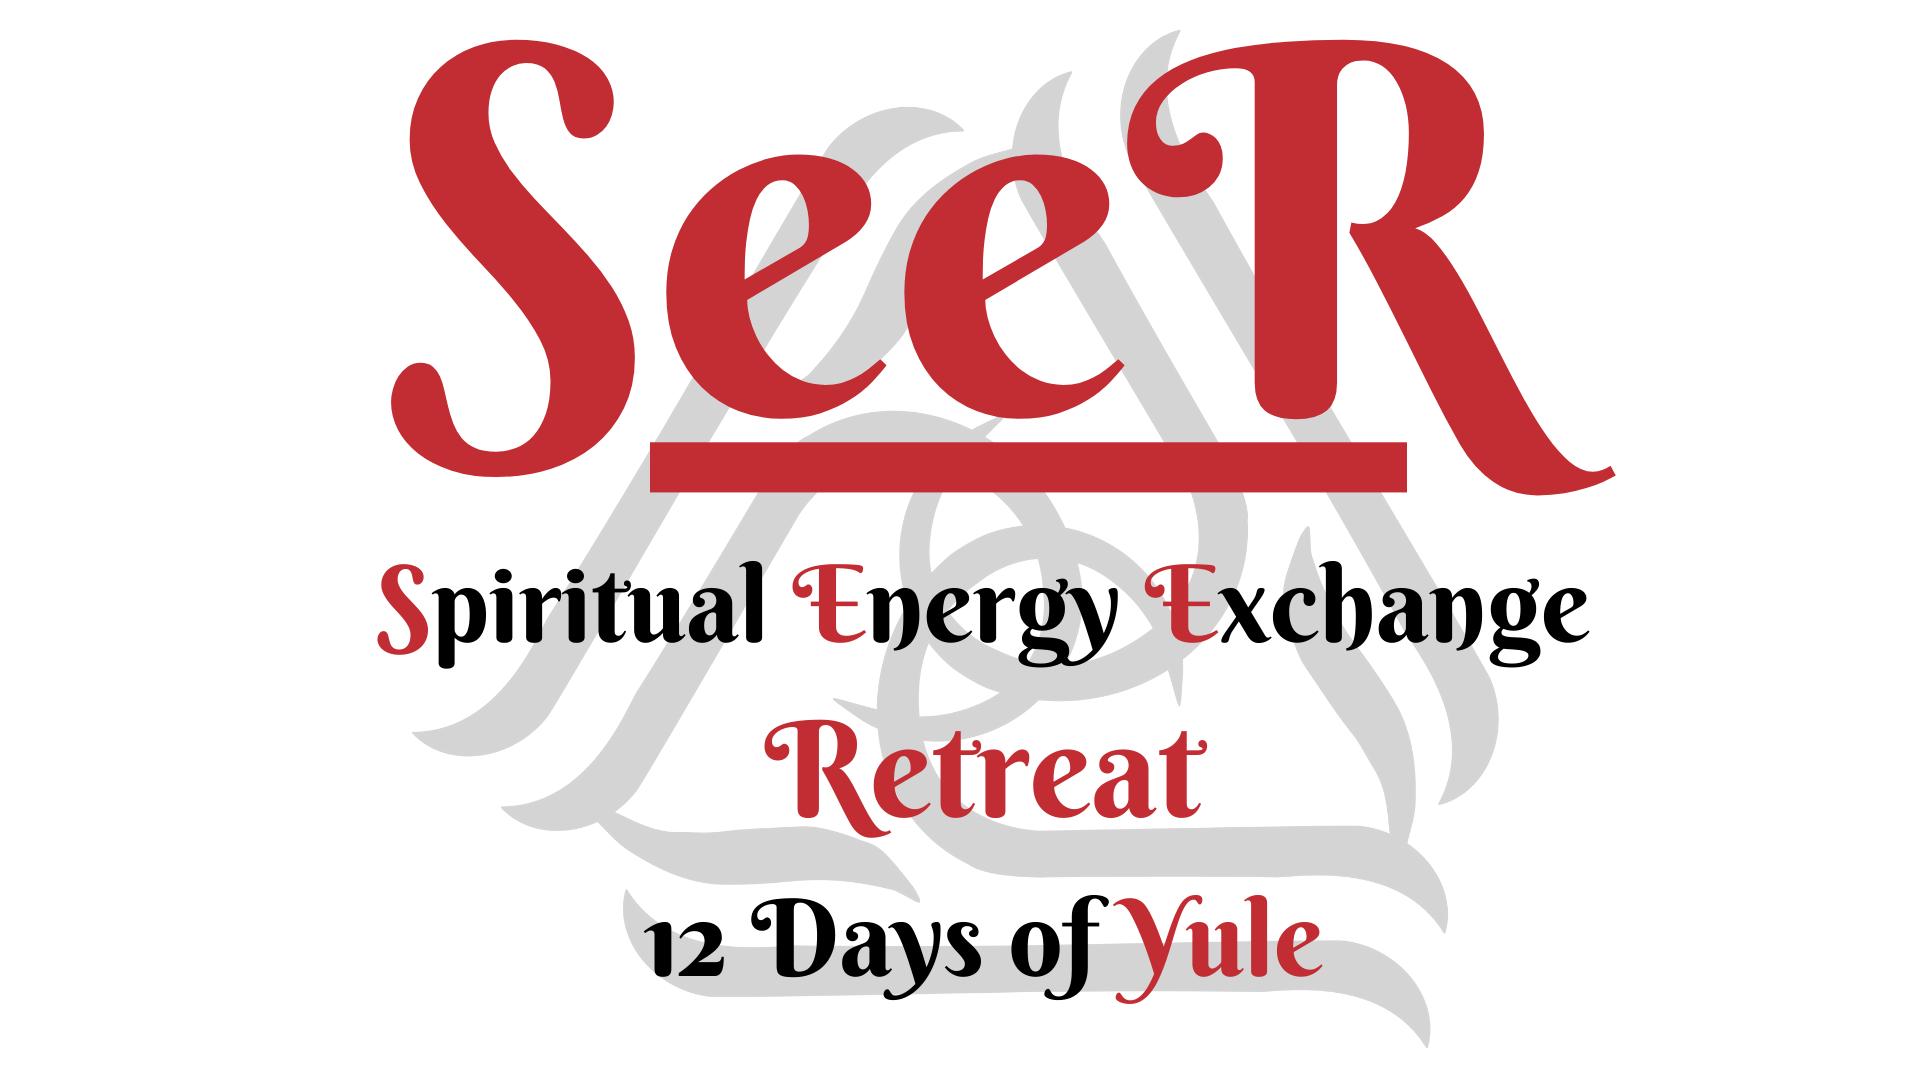 SeeR Spiritual Energy Exchange Retreat in South West Scotland